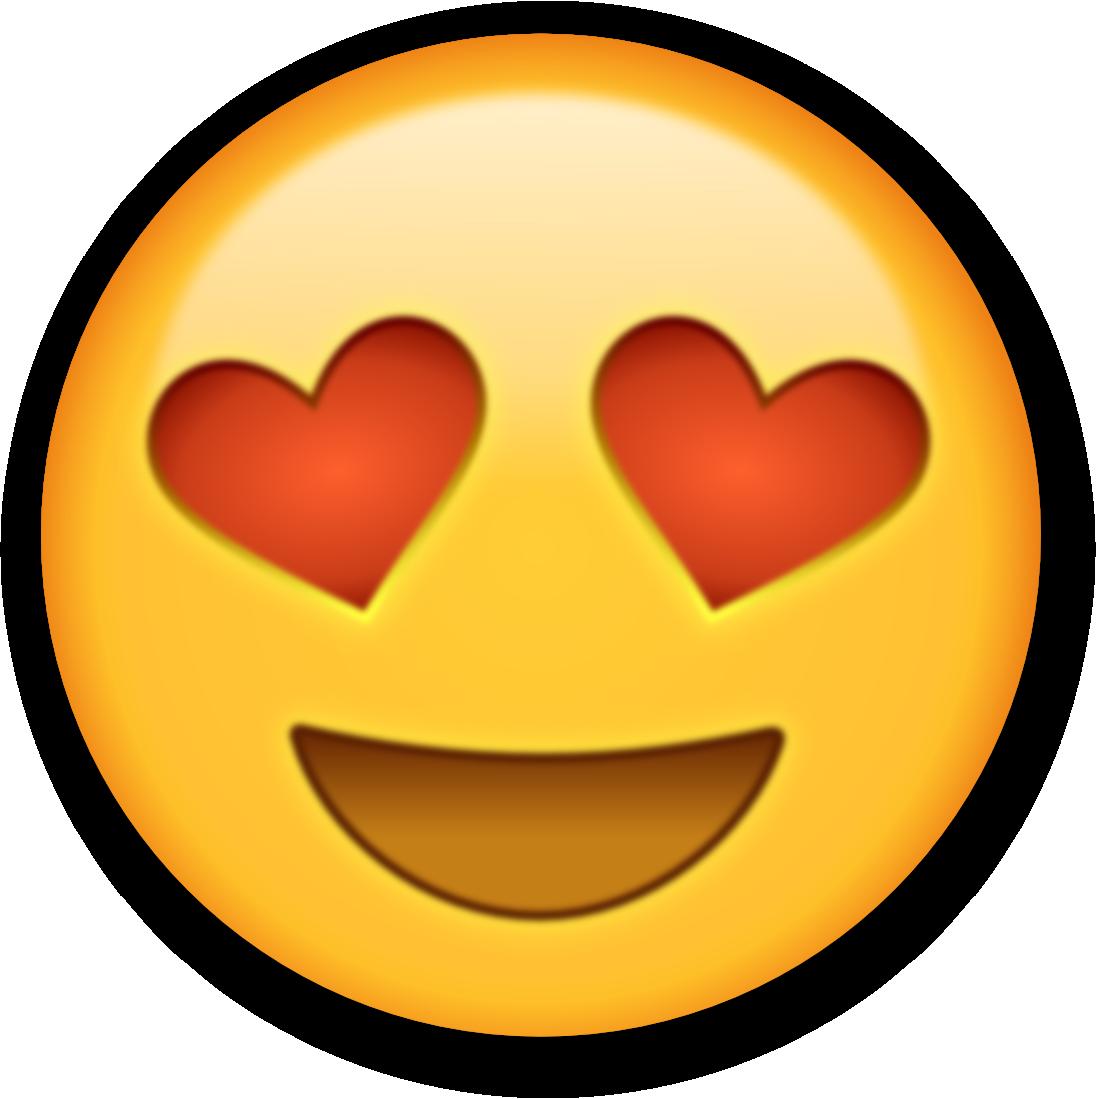 That i put download. Emoji clipart iphone